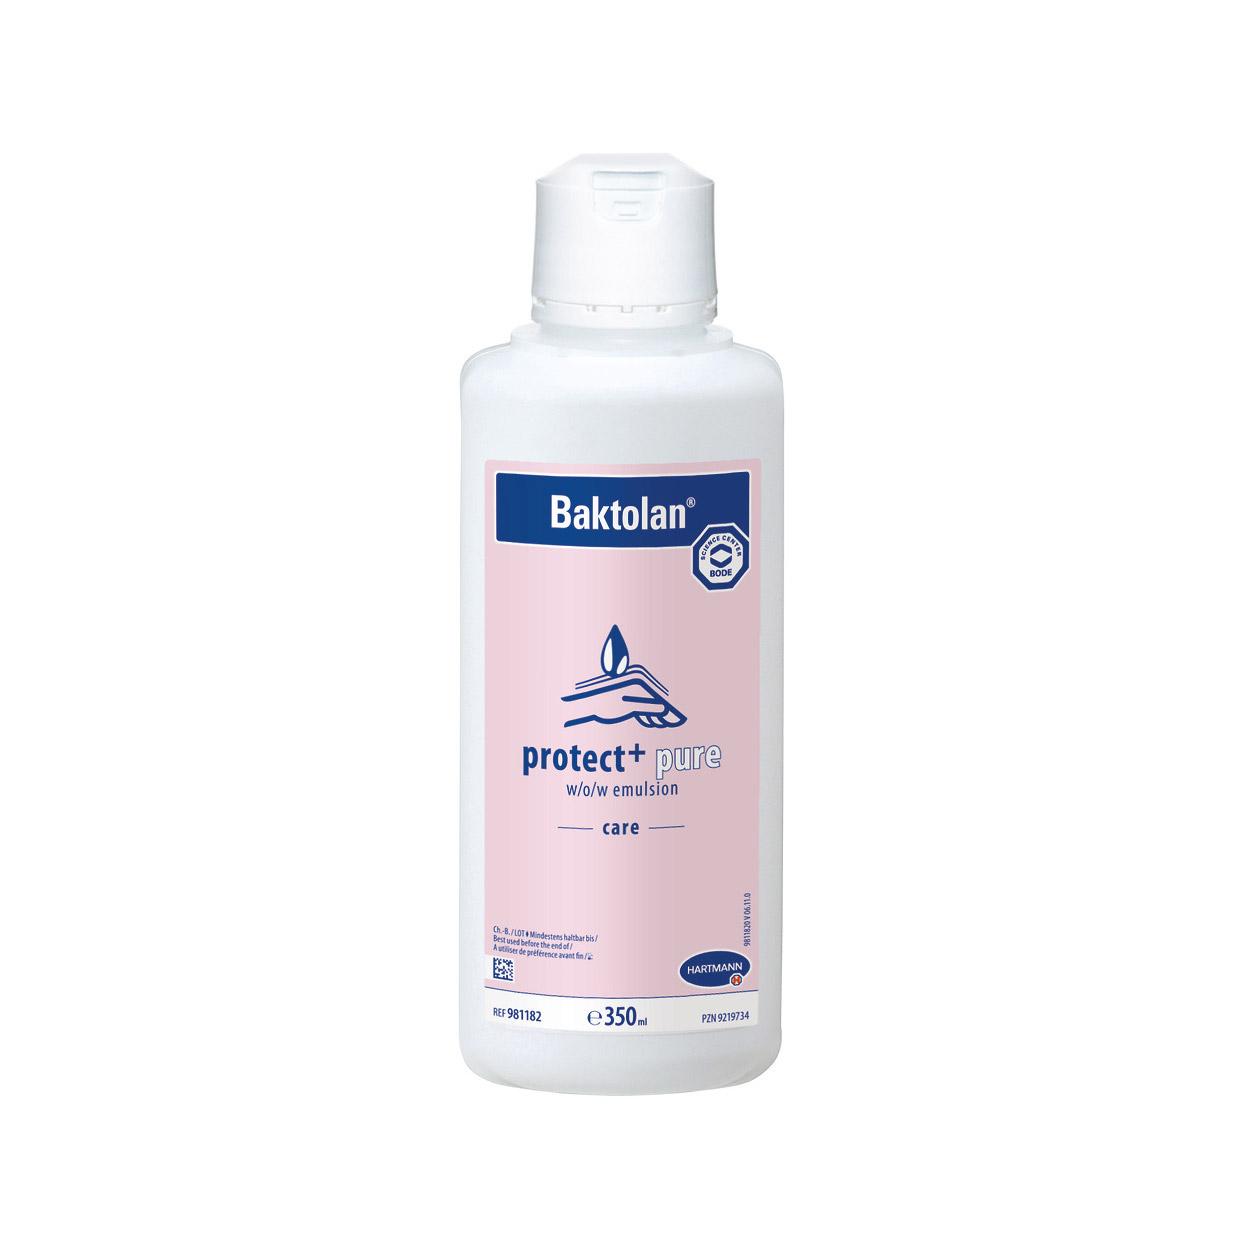 Baktolan® protect + pure, 350 ml-Flasche